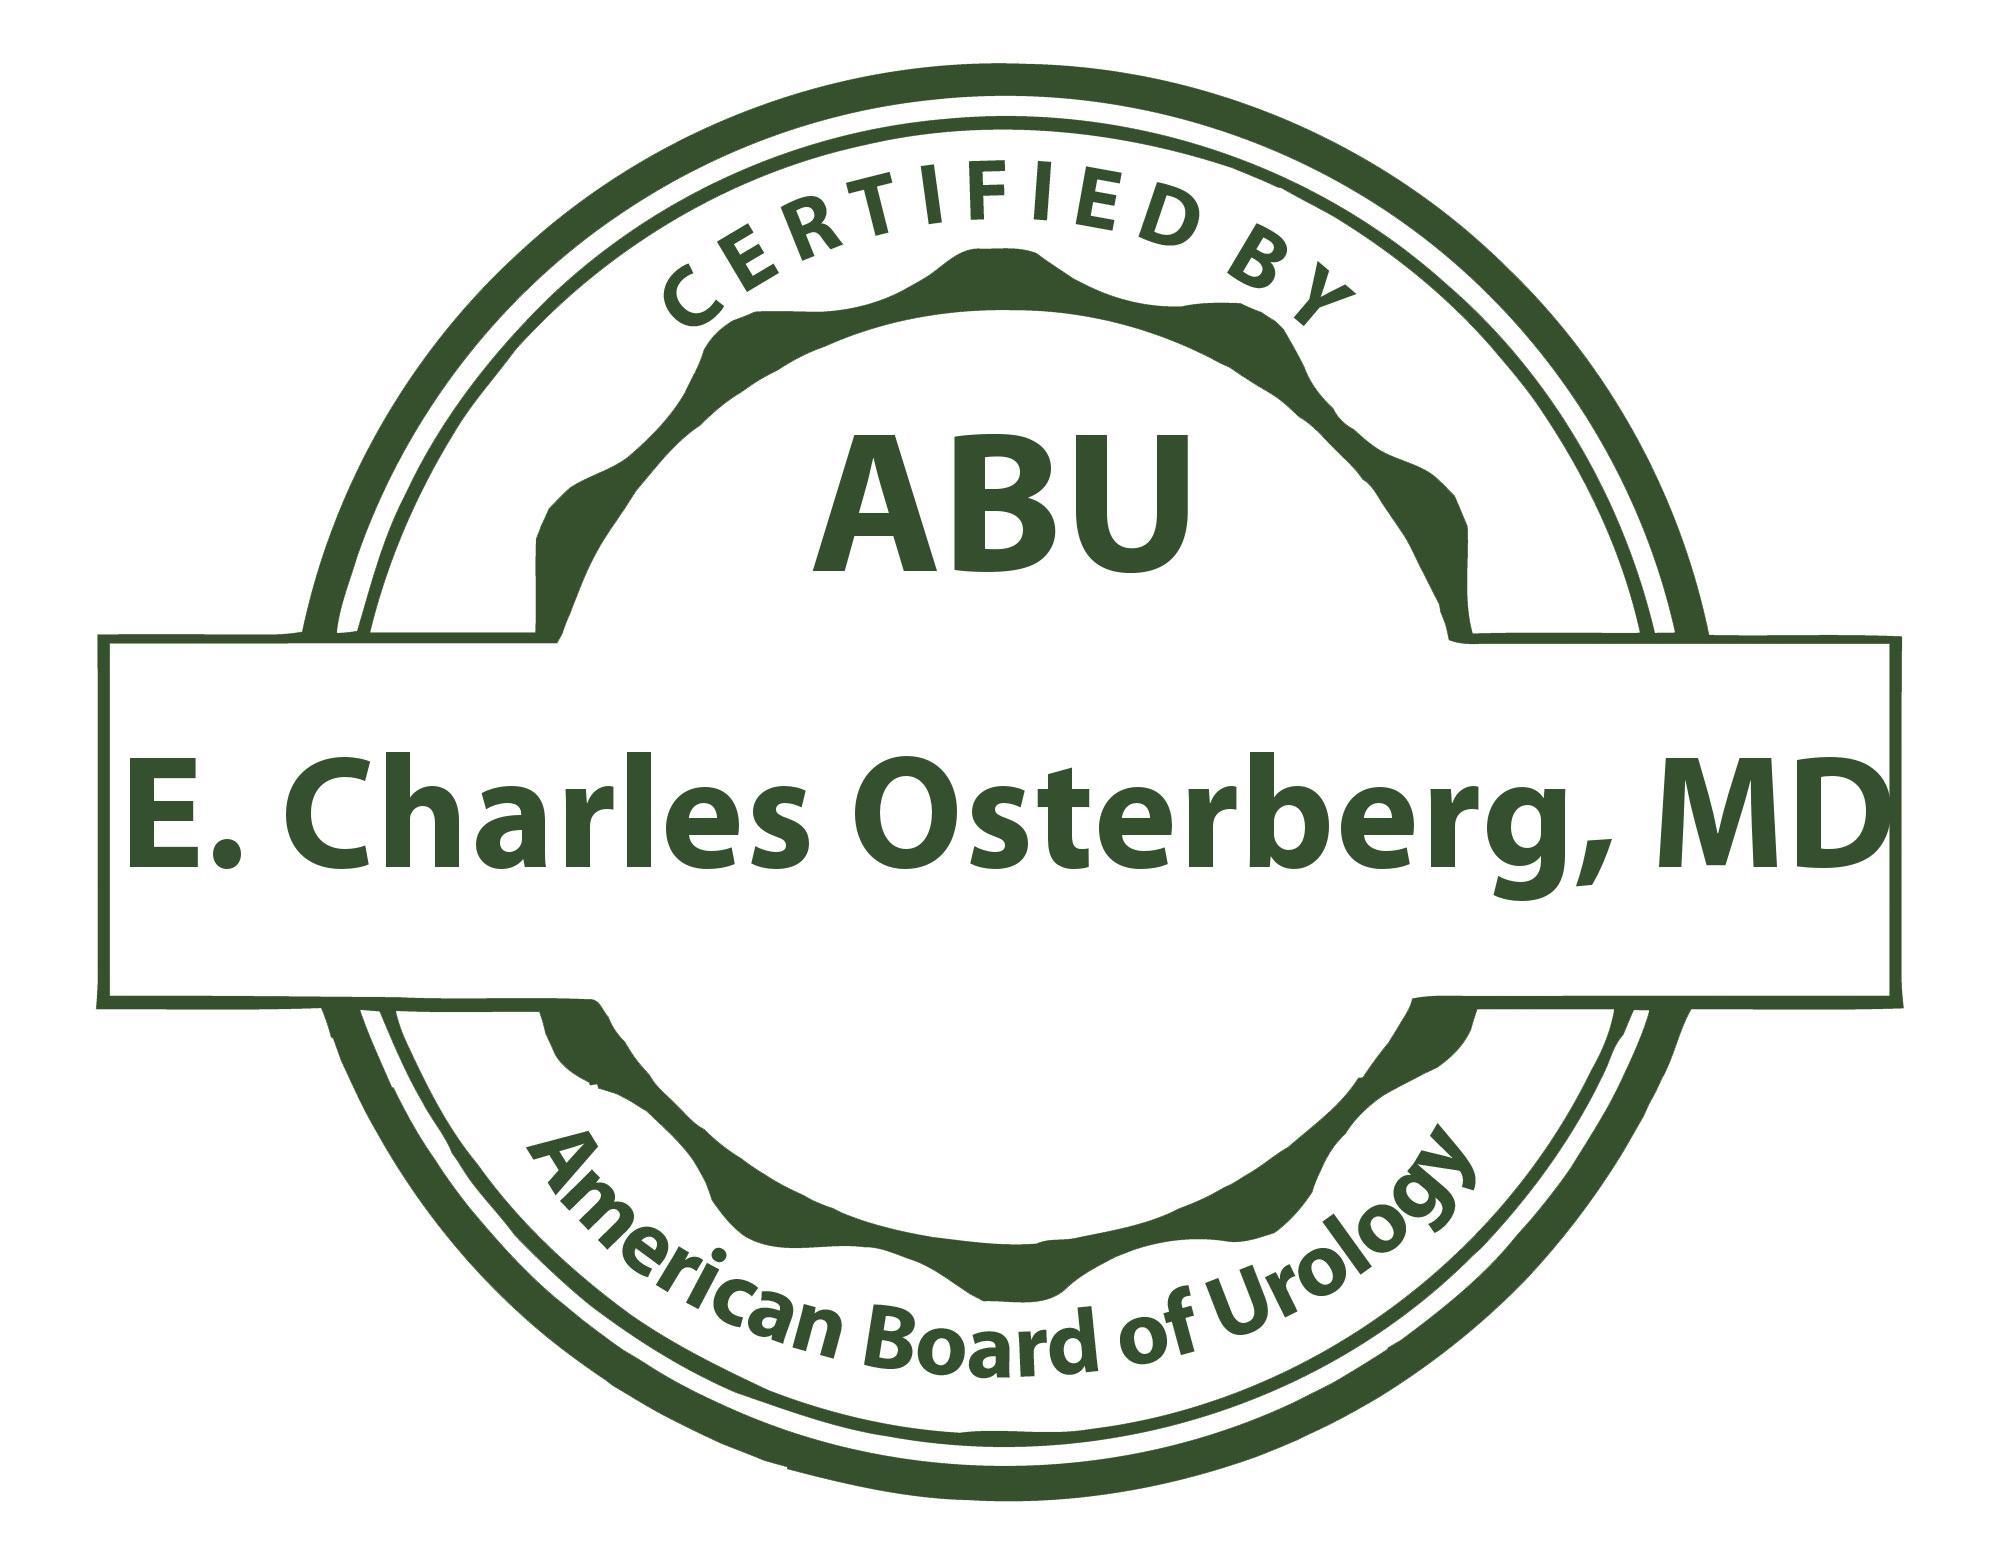 abu_certification.jpg